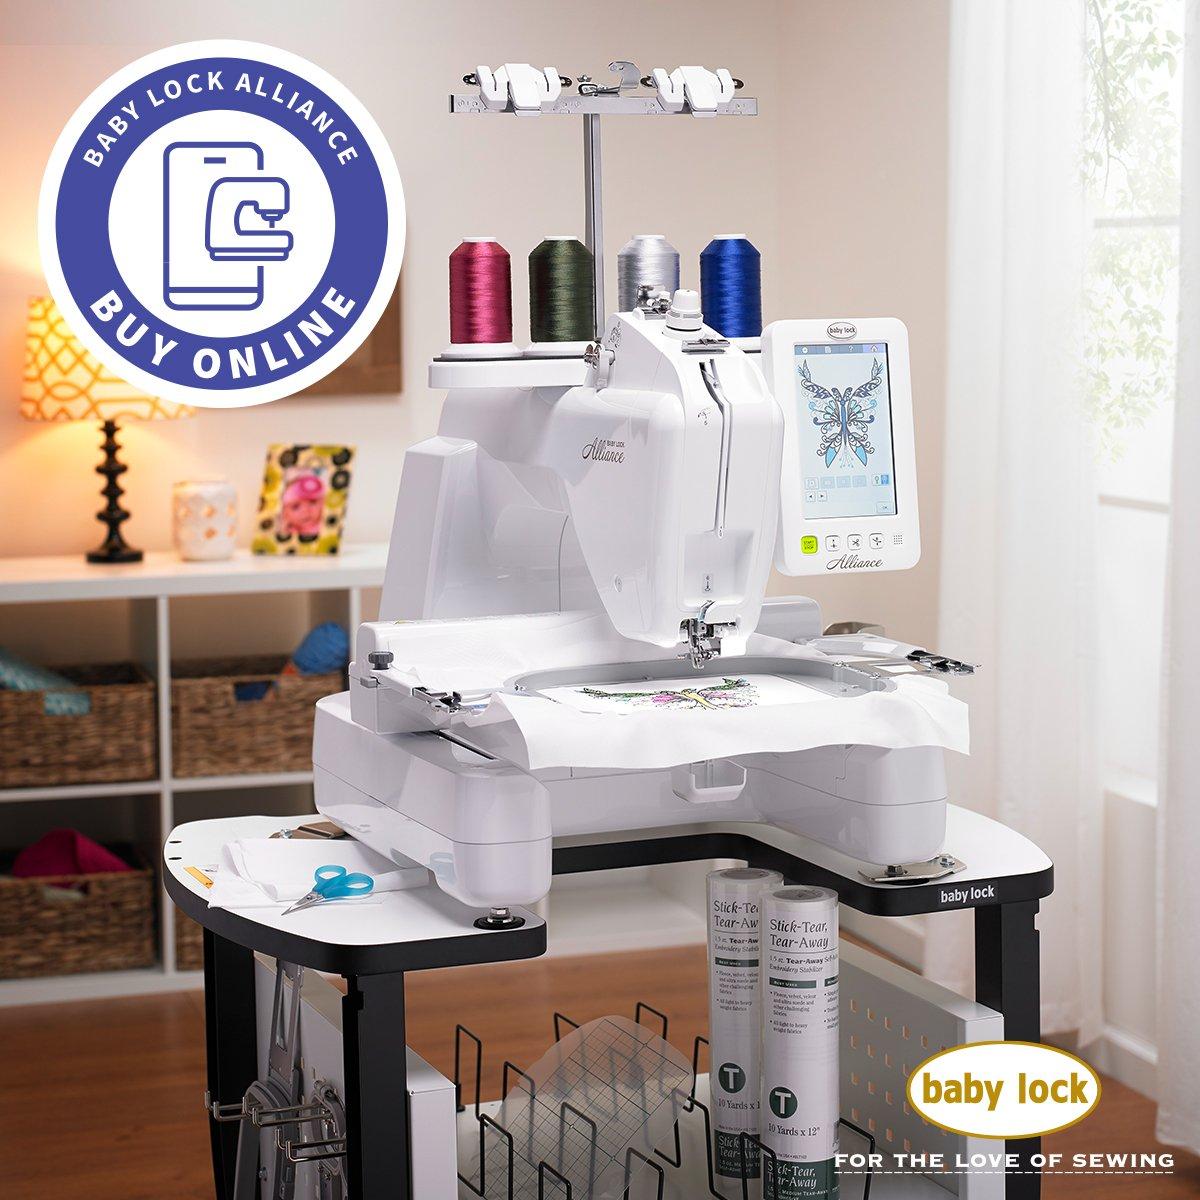 Alliance Sewing Machine